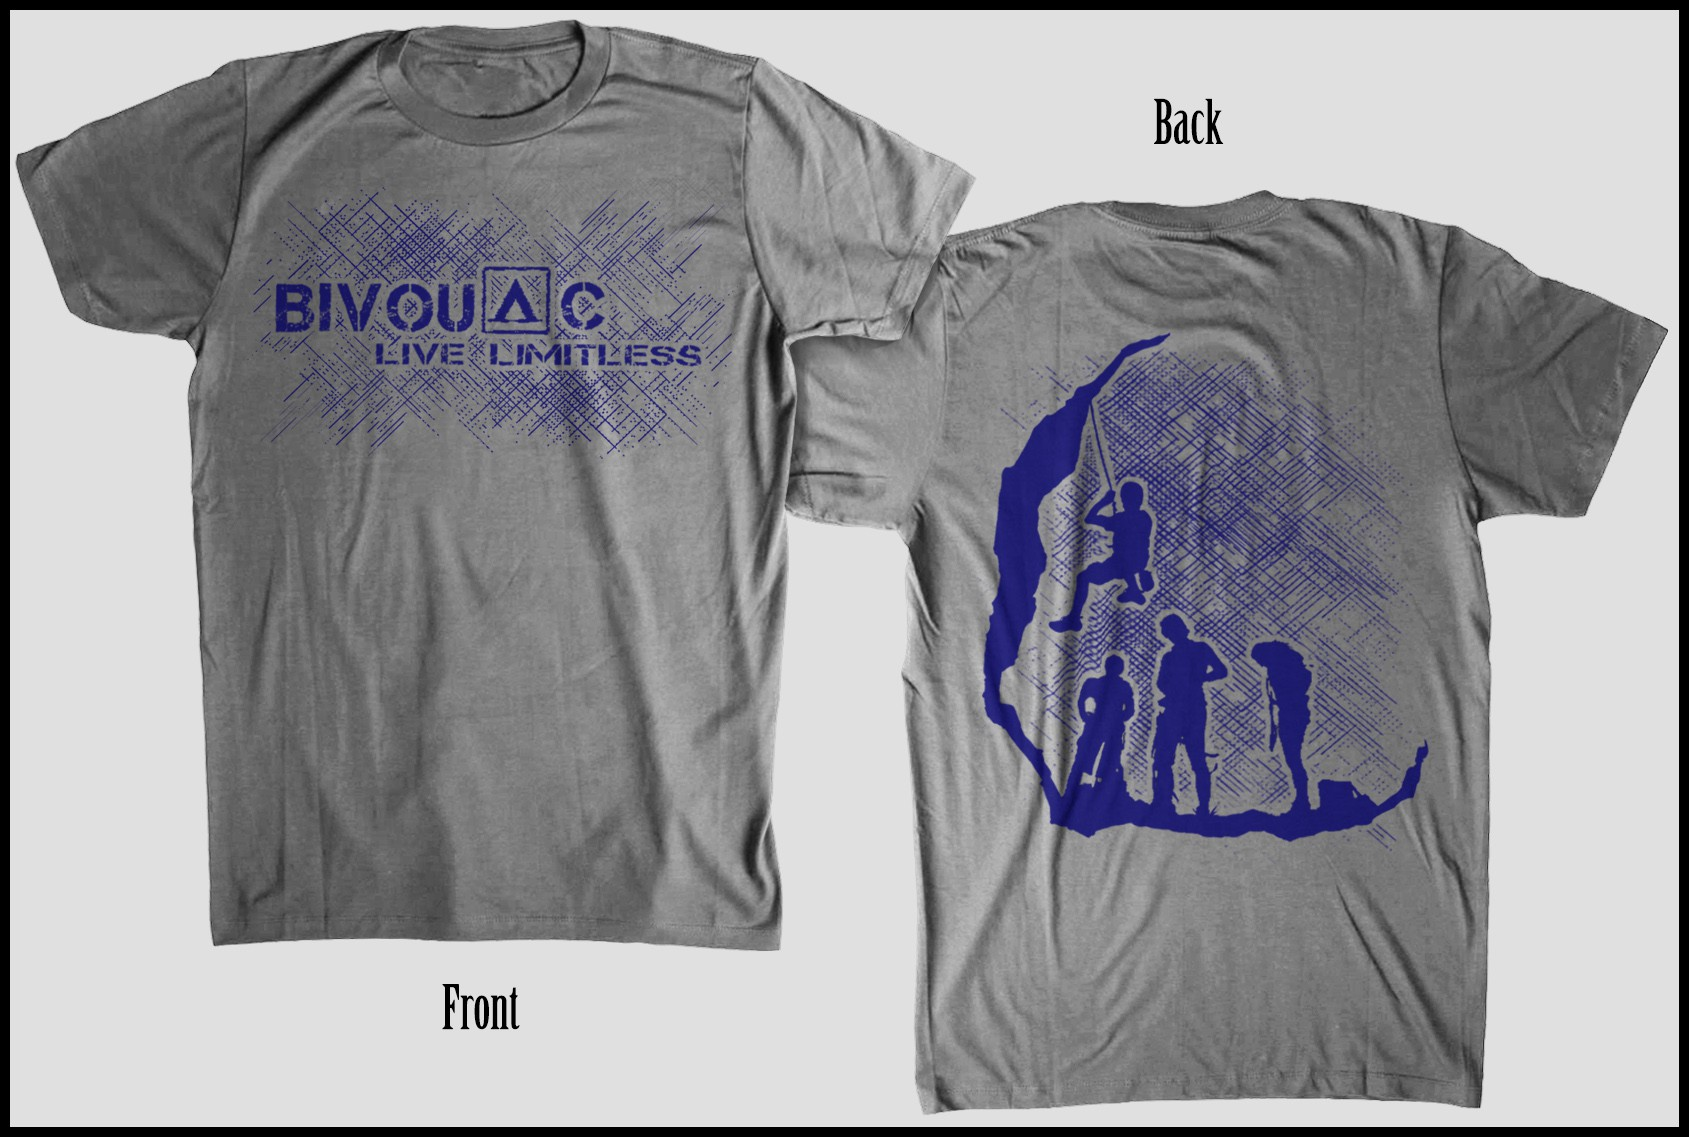 New Outdoor Company Seeking T-Shirt Designs!